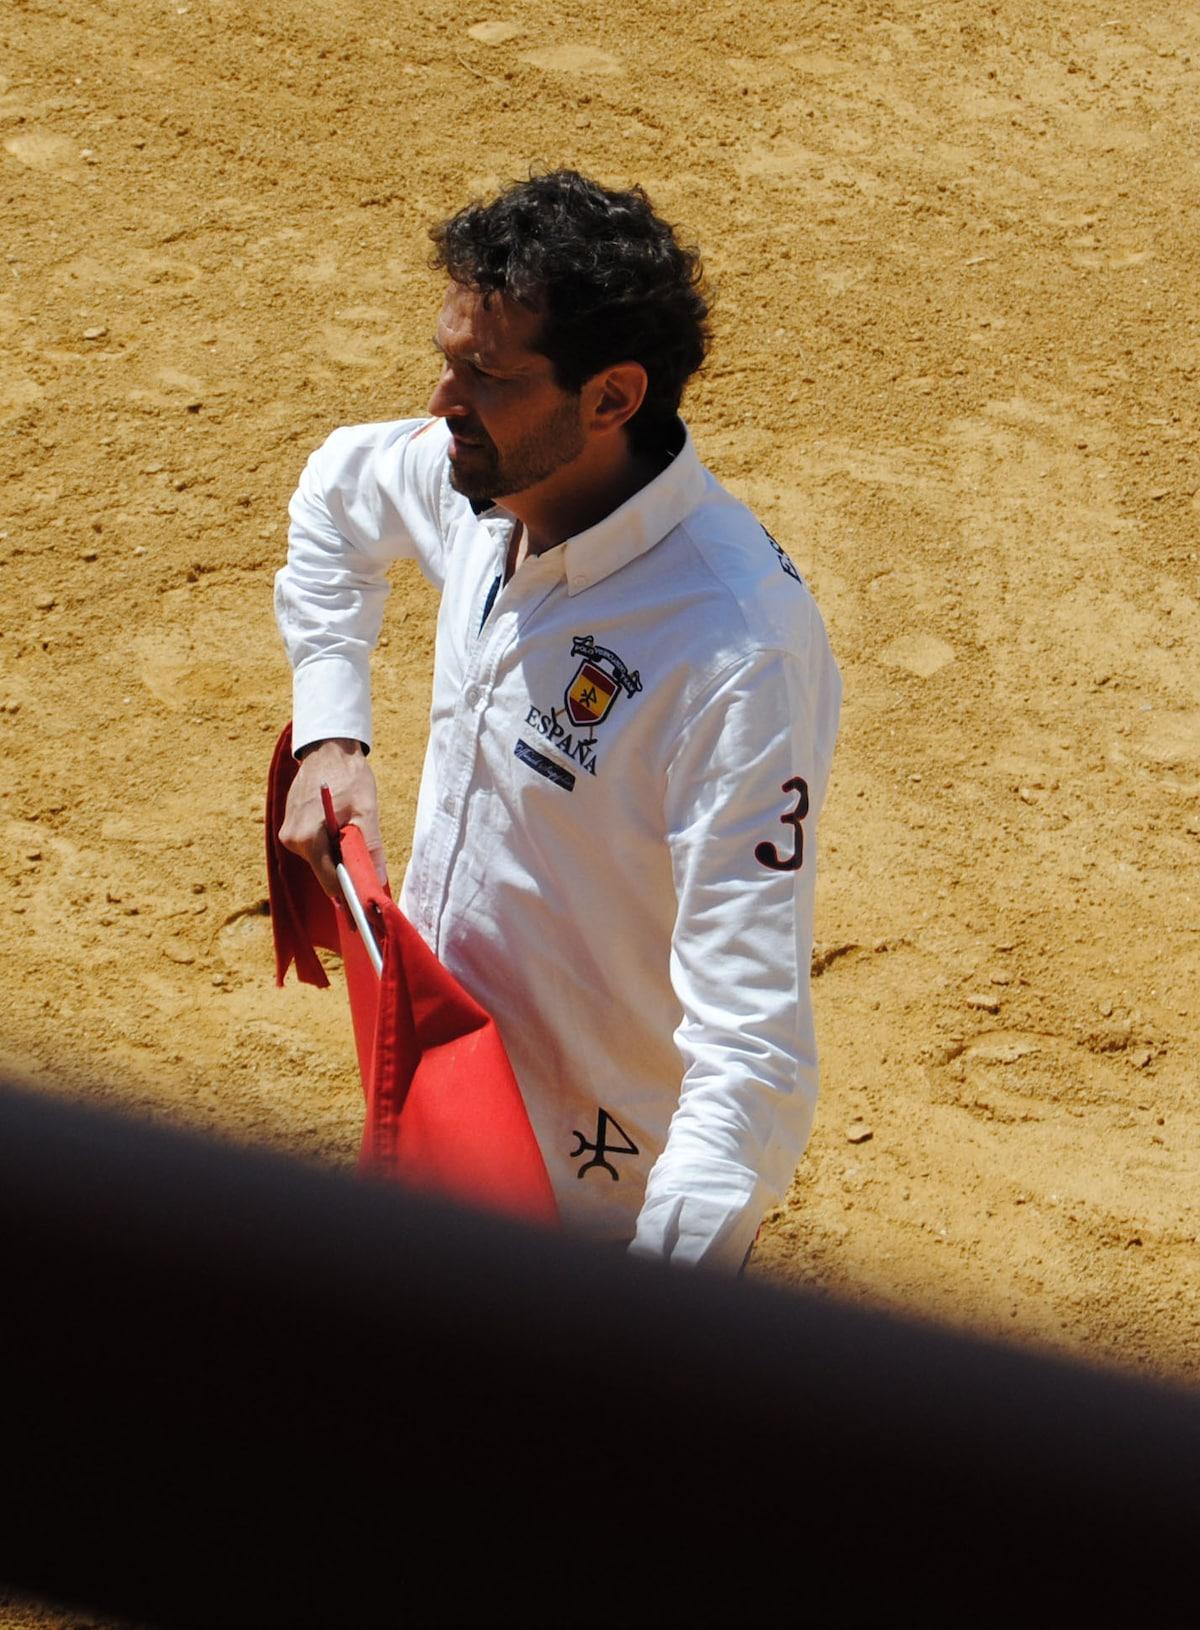 Pedro from Madrid